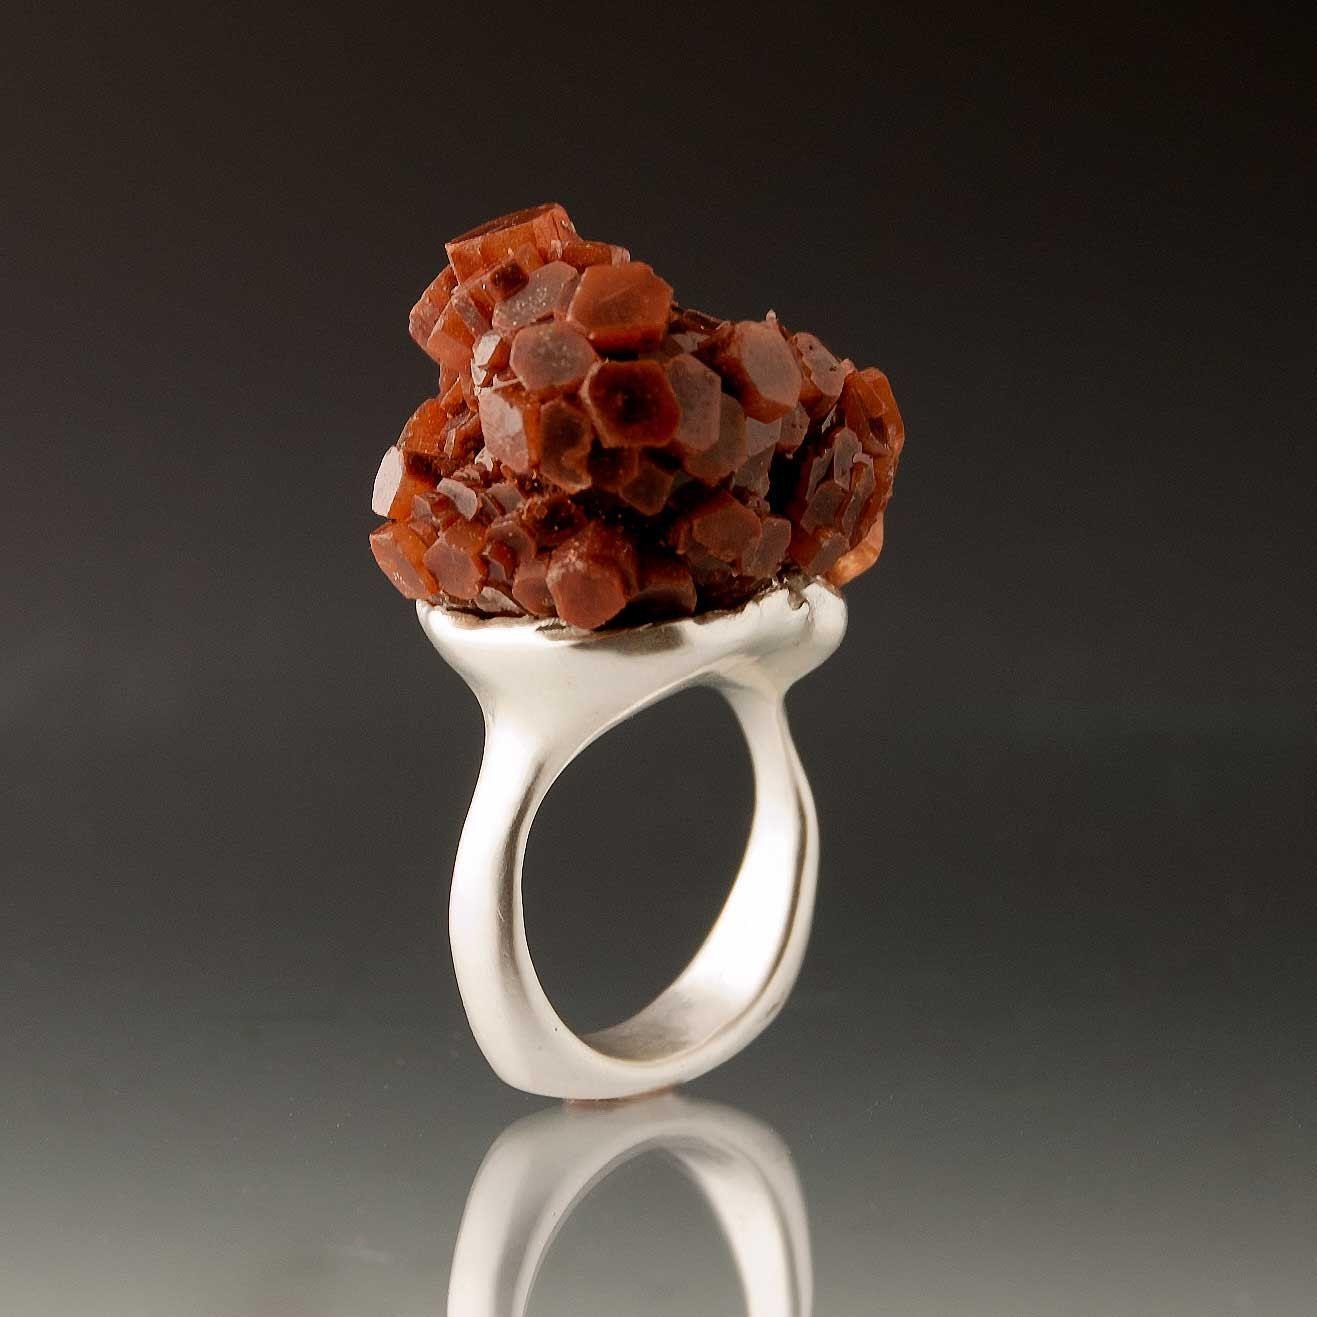 Aragonite Crystal Cluster Sterling Silver Ring Raw Gemstone Ring $175.00 #rings